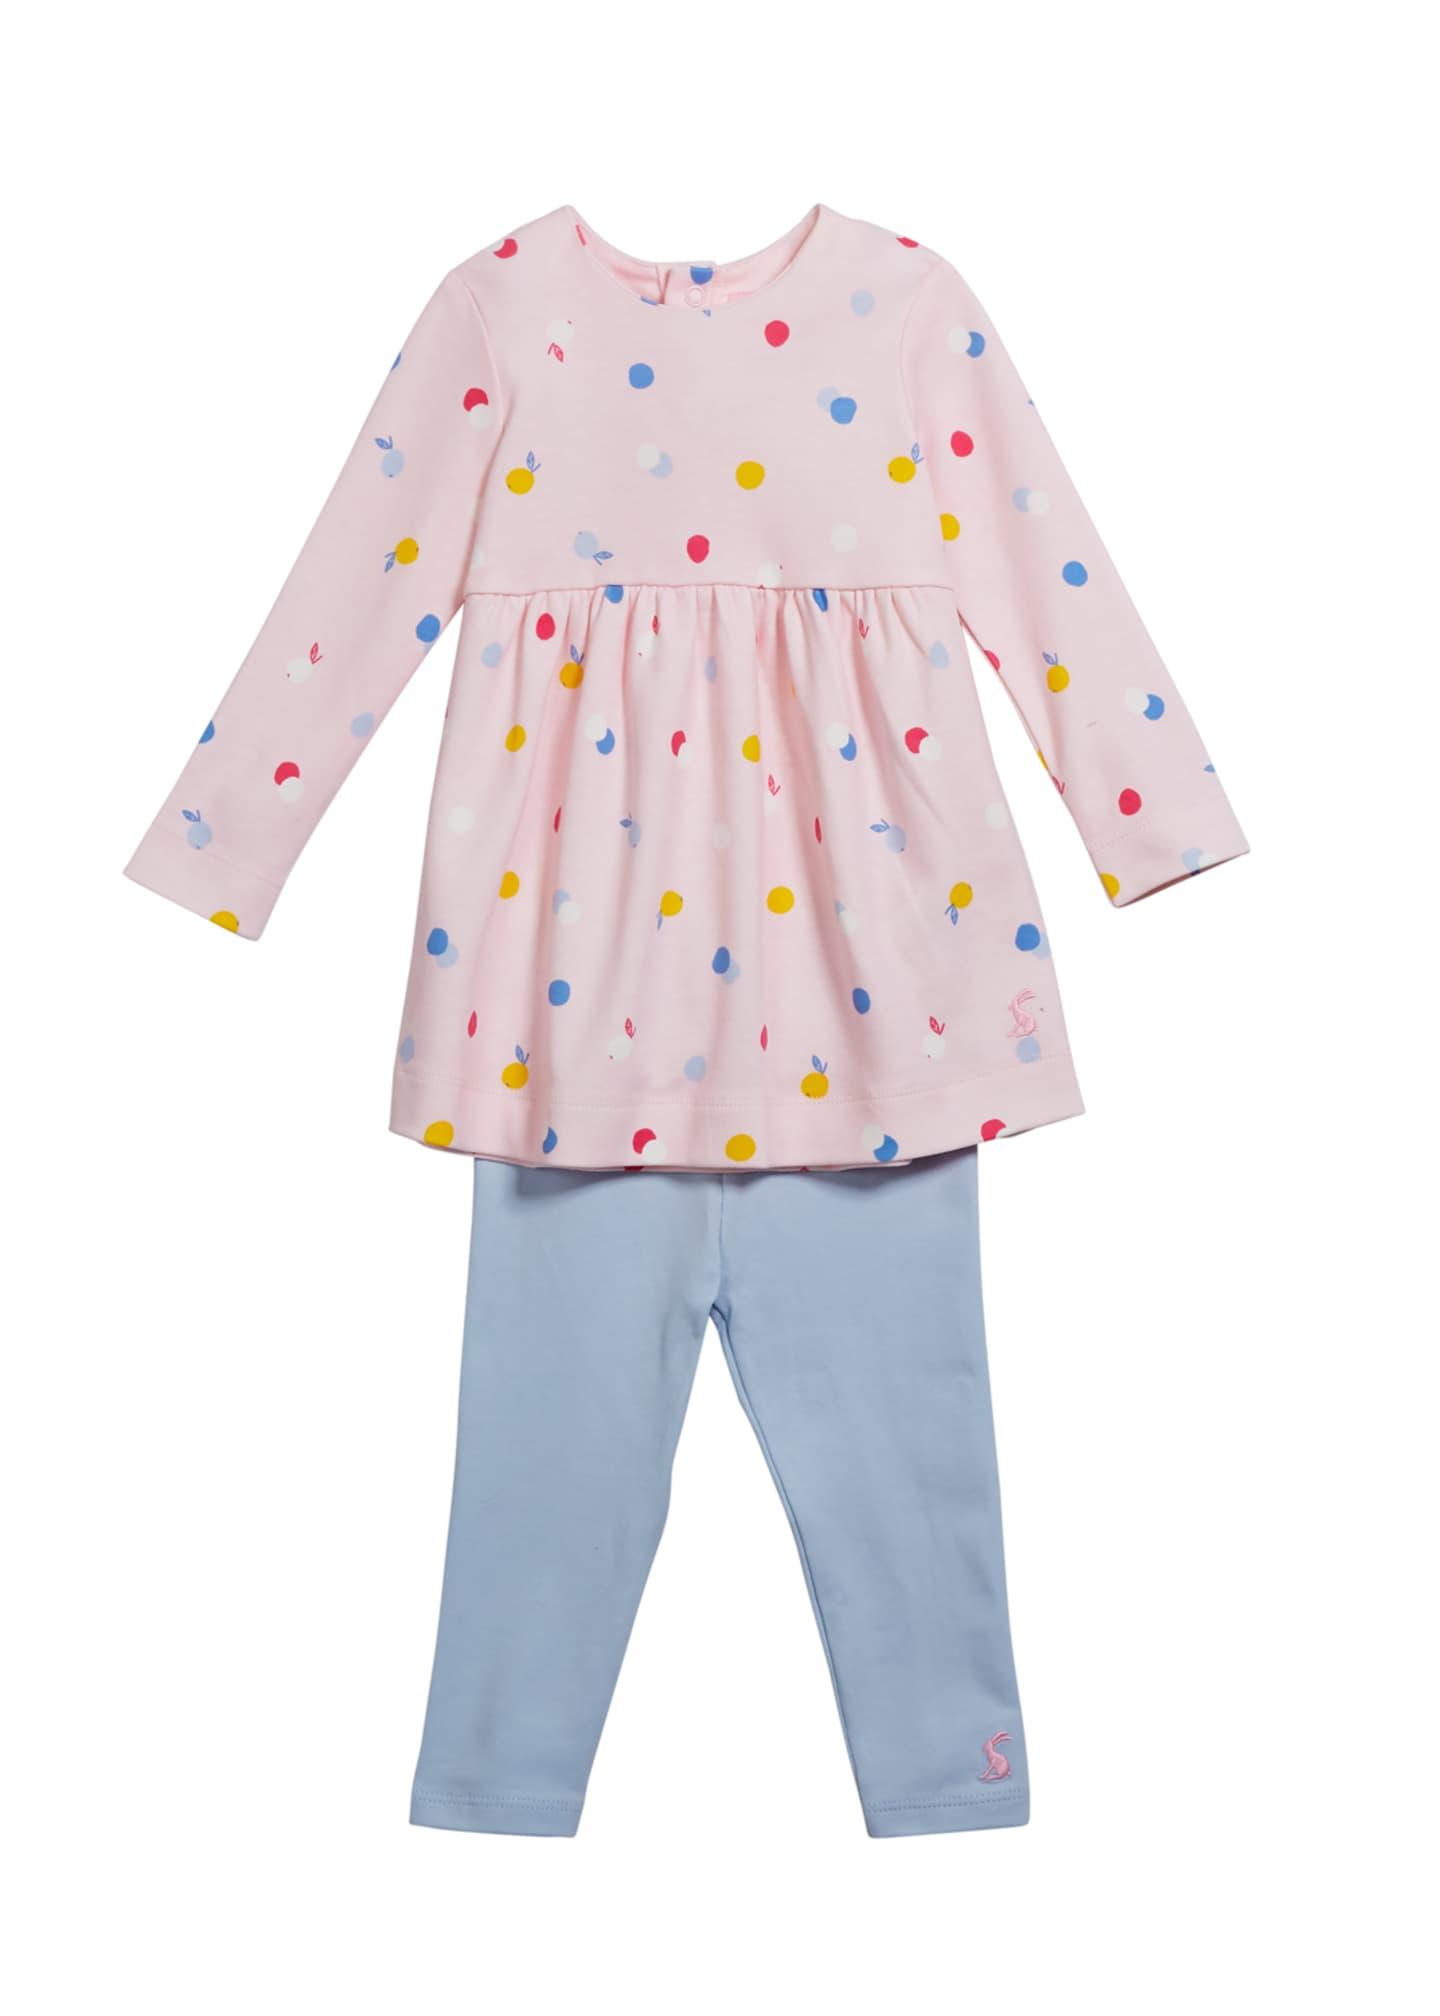 Joules Christina Long-Sleeve Dress w/ Leggings, Size 6-24